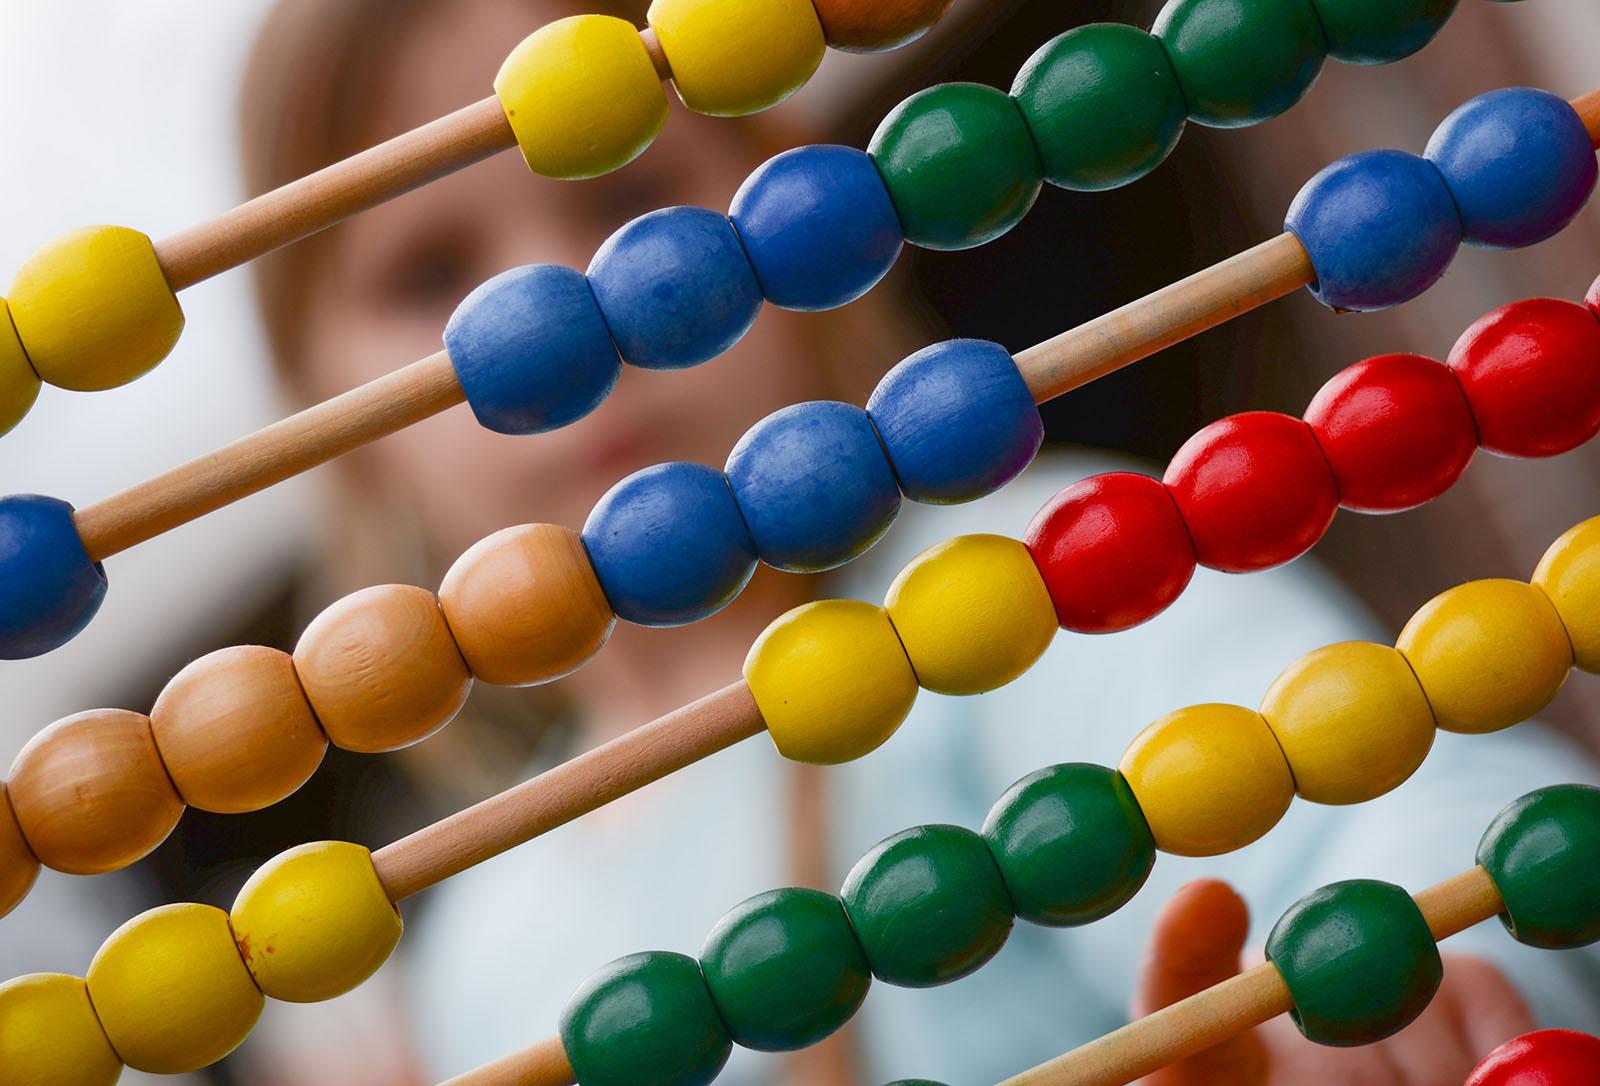 Basic math concepts for Digital Marketing (Part 1)